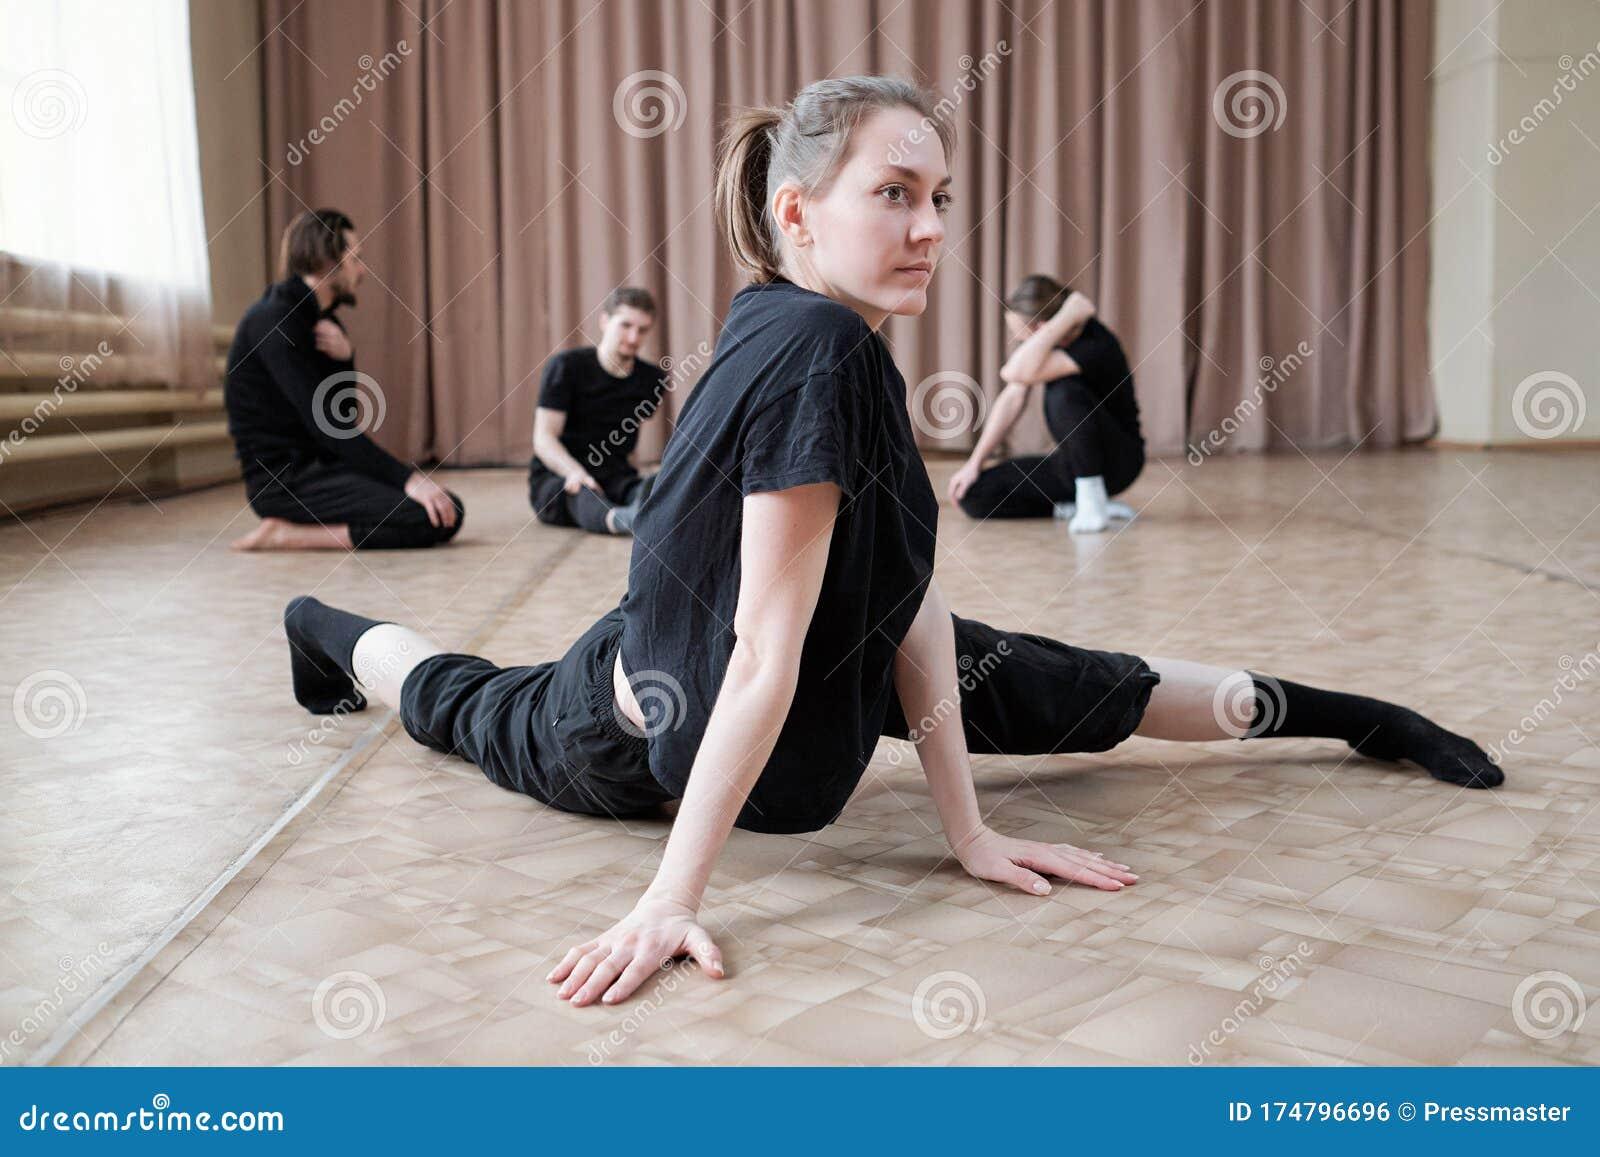 European ballerina stock photo. Image of flexible, dancer